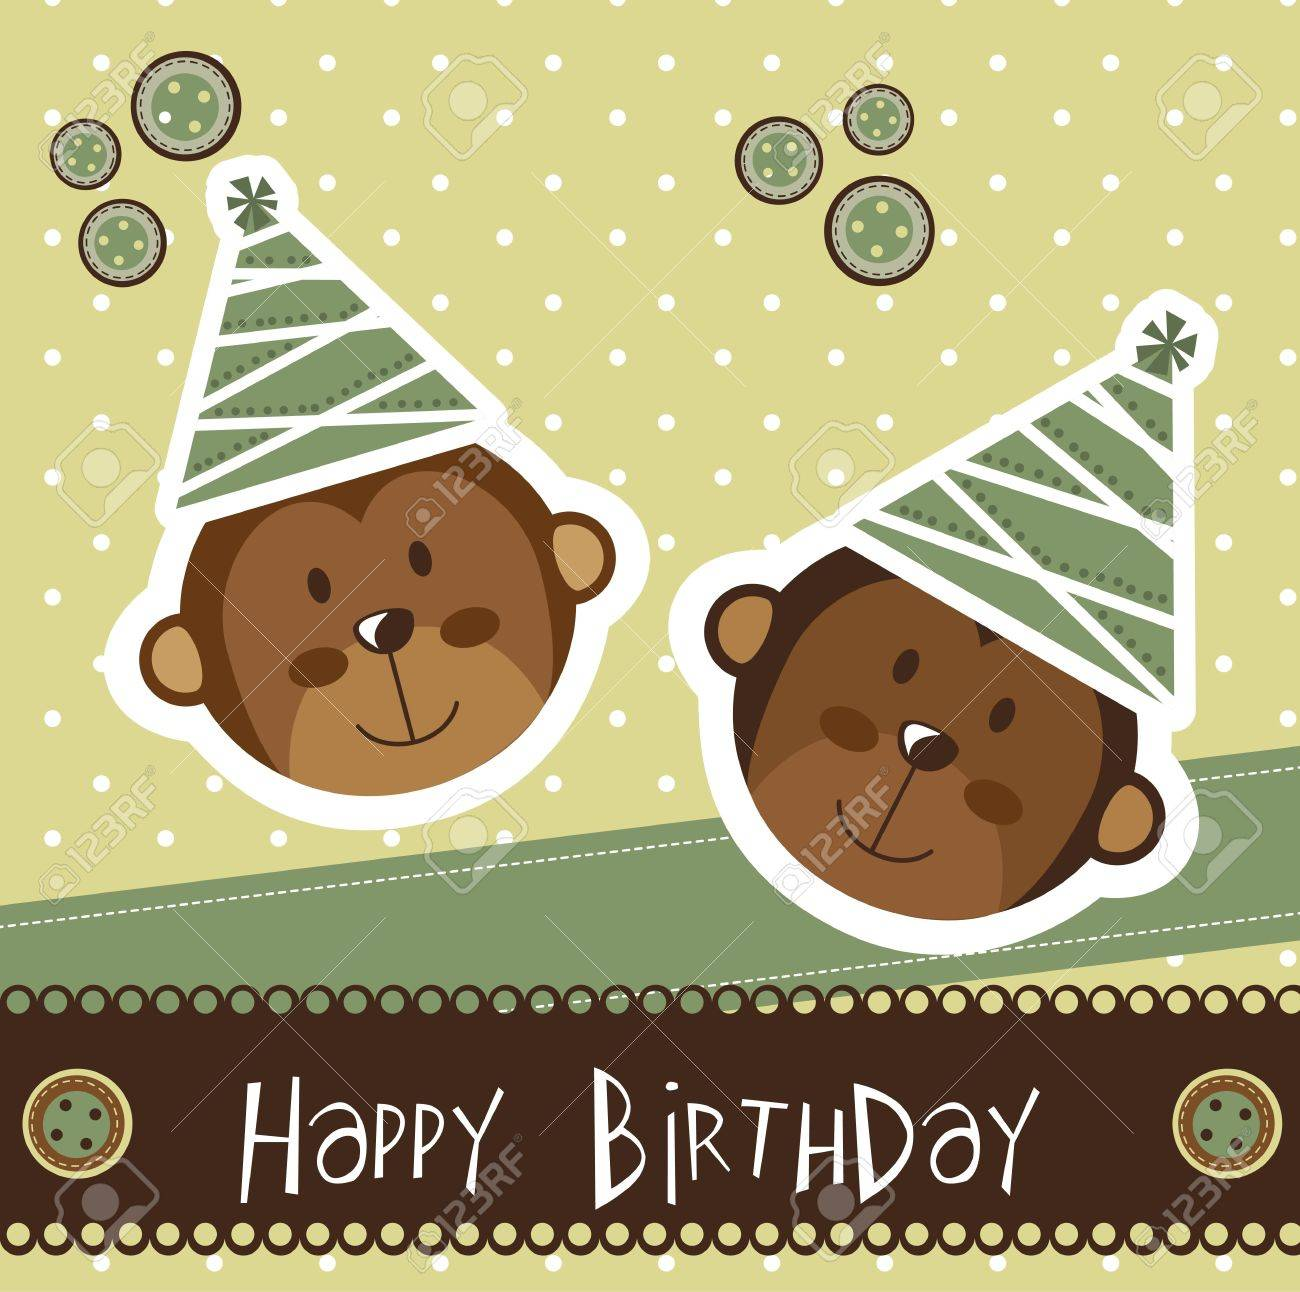 Birthday Card With Cute Monkey Royalty Free Cliparts Vectors – Monkey Birthday Card